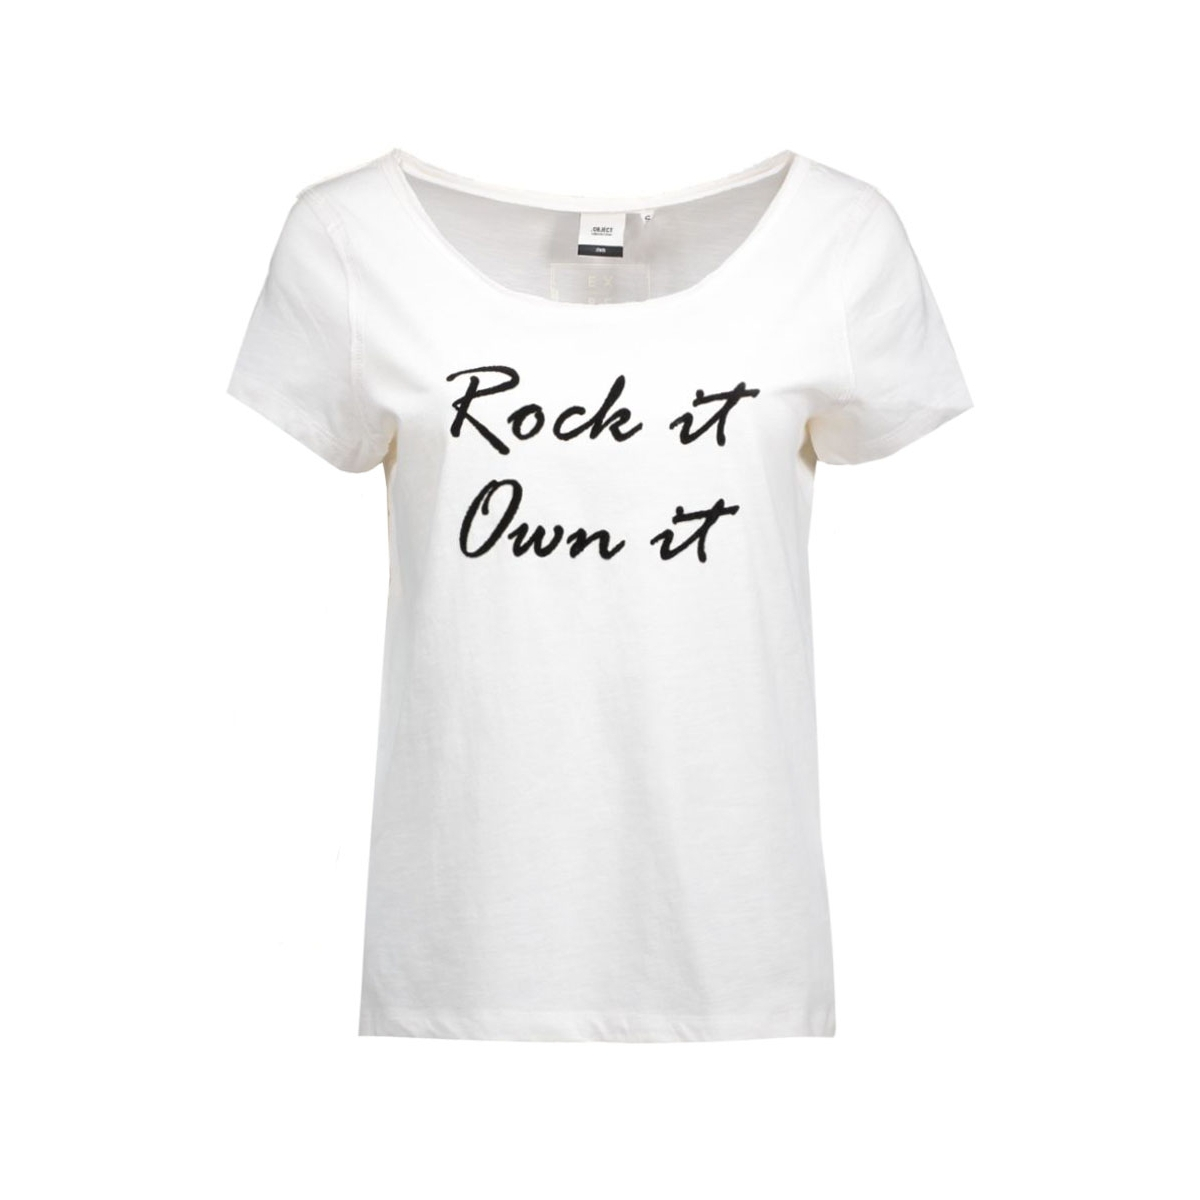 objfrancis marie s/s top .i 87 23023187 object t-shirt gardenia